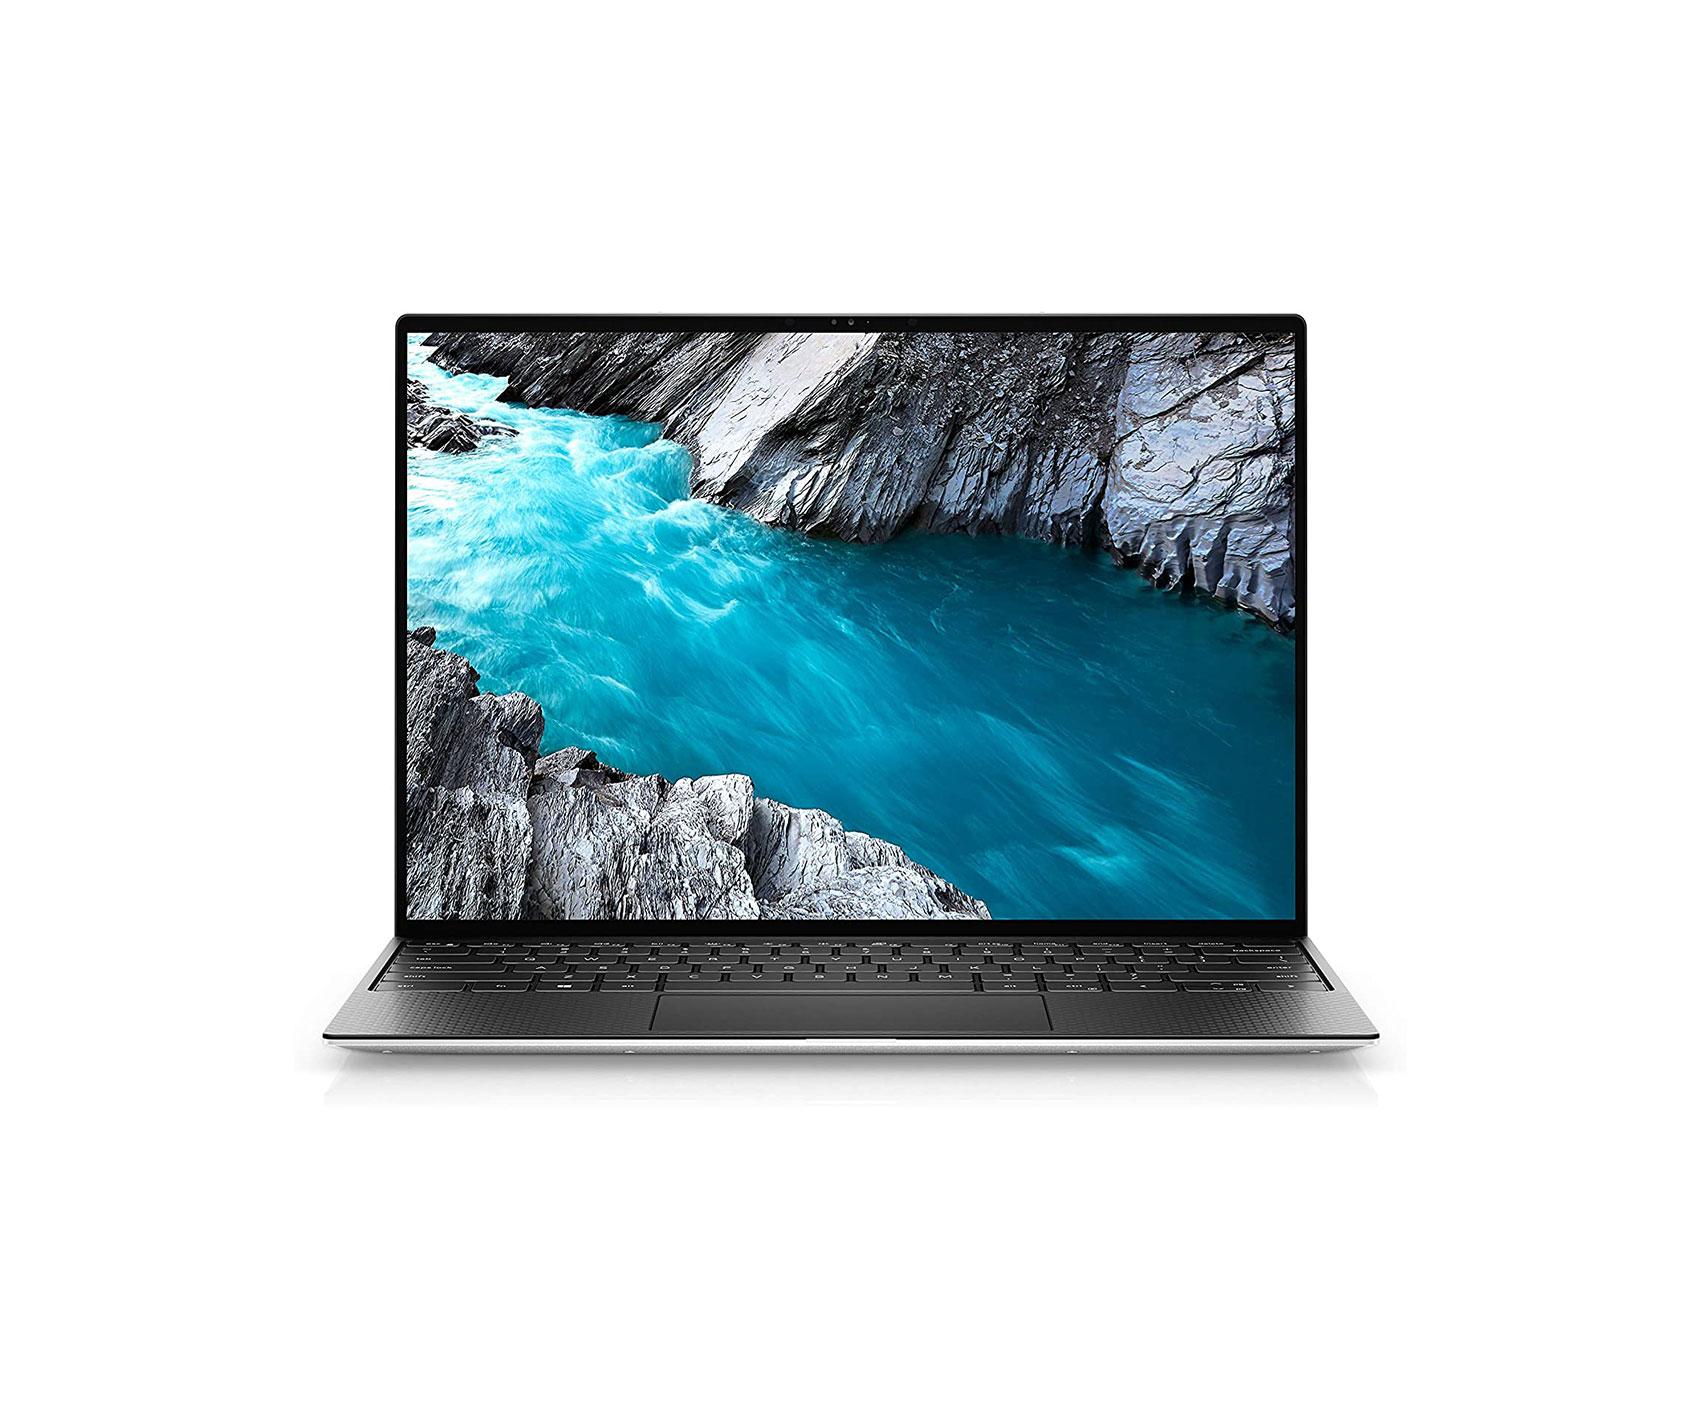 Dell XPS 13 9310 Laptop